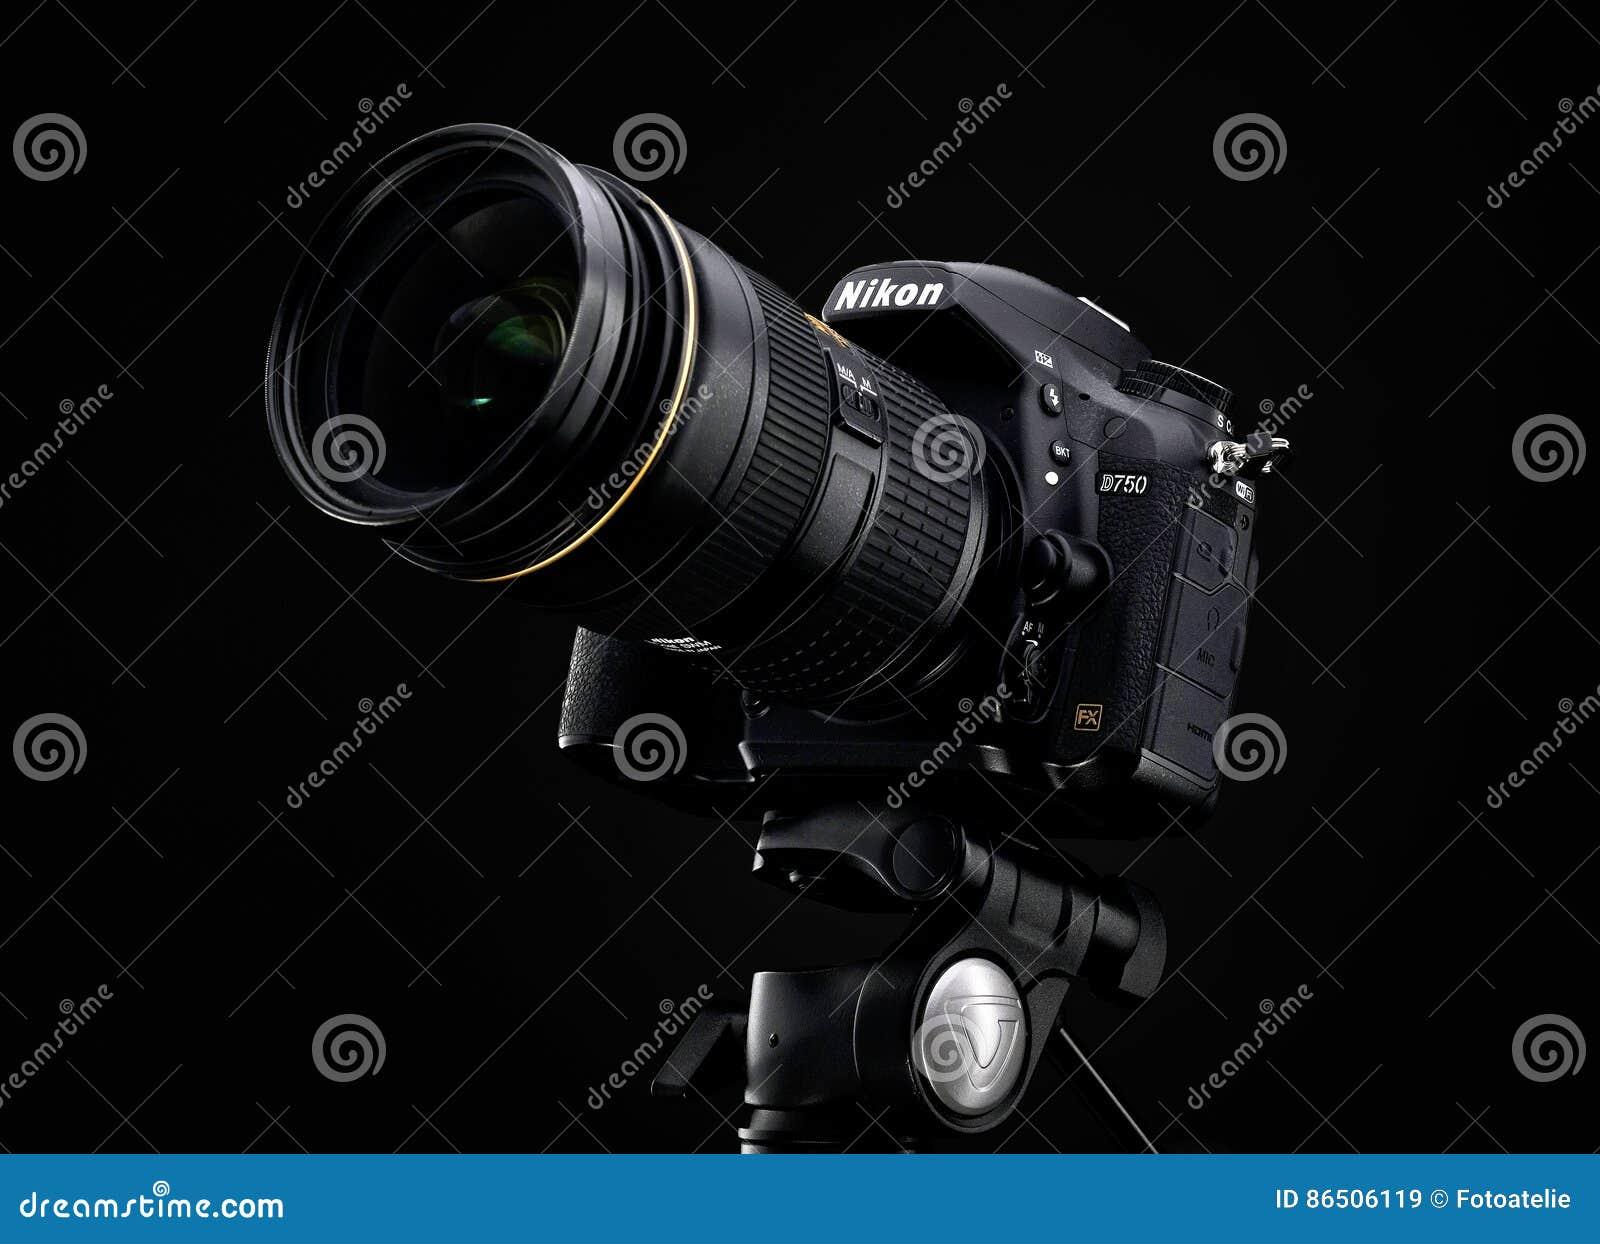 Nikon d750 and zoom lens over black background